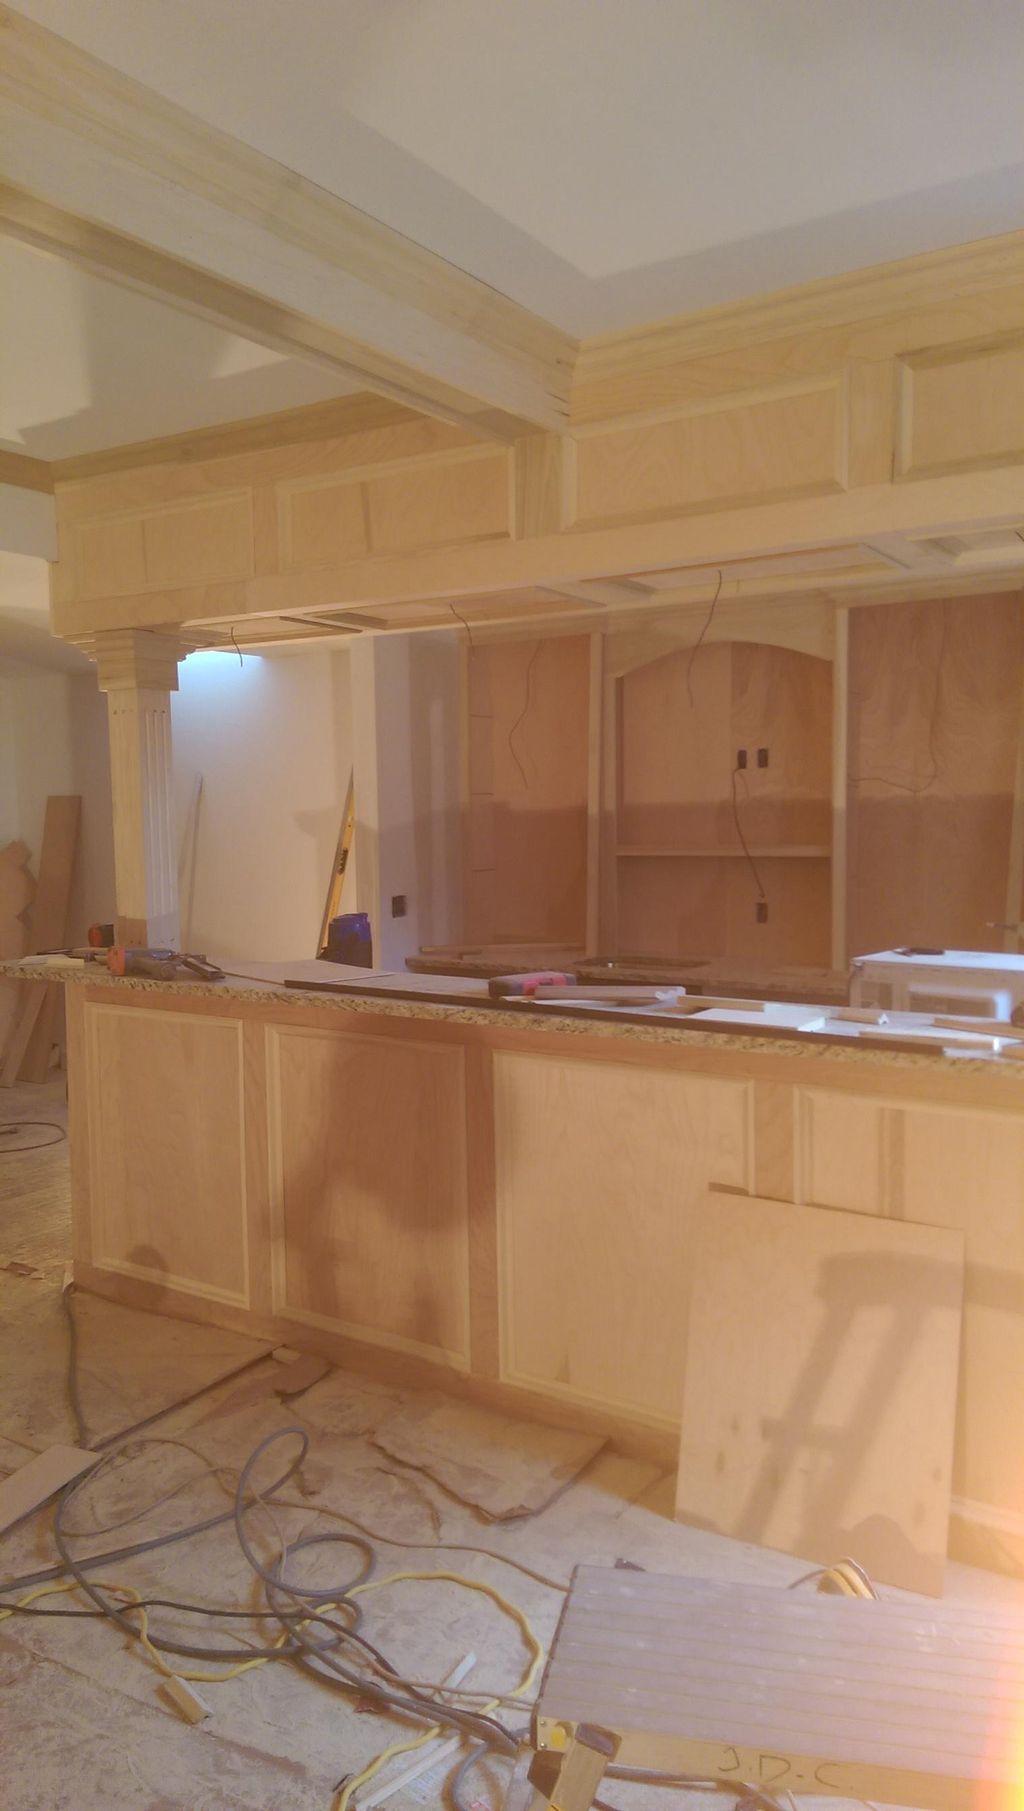 JDC Kitchen and Trim Carpentry